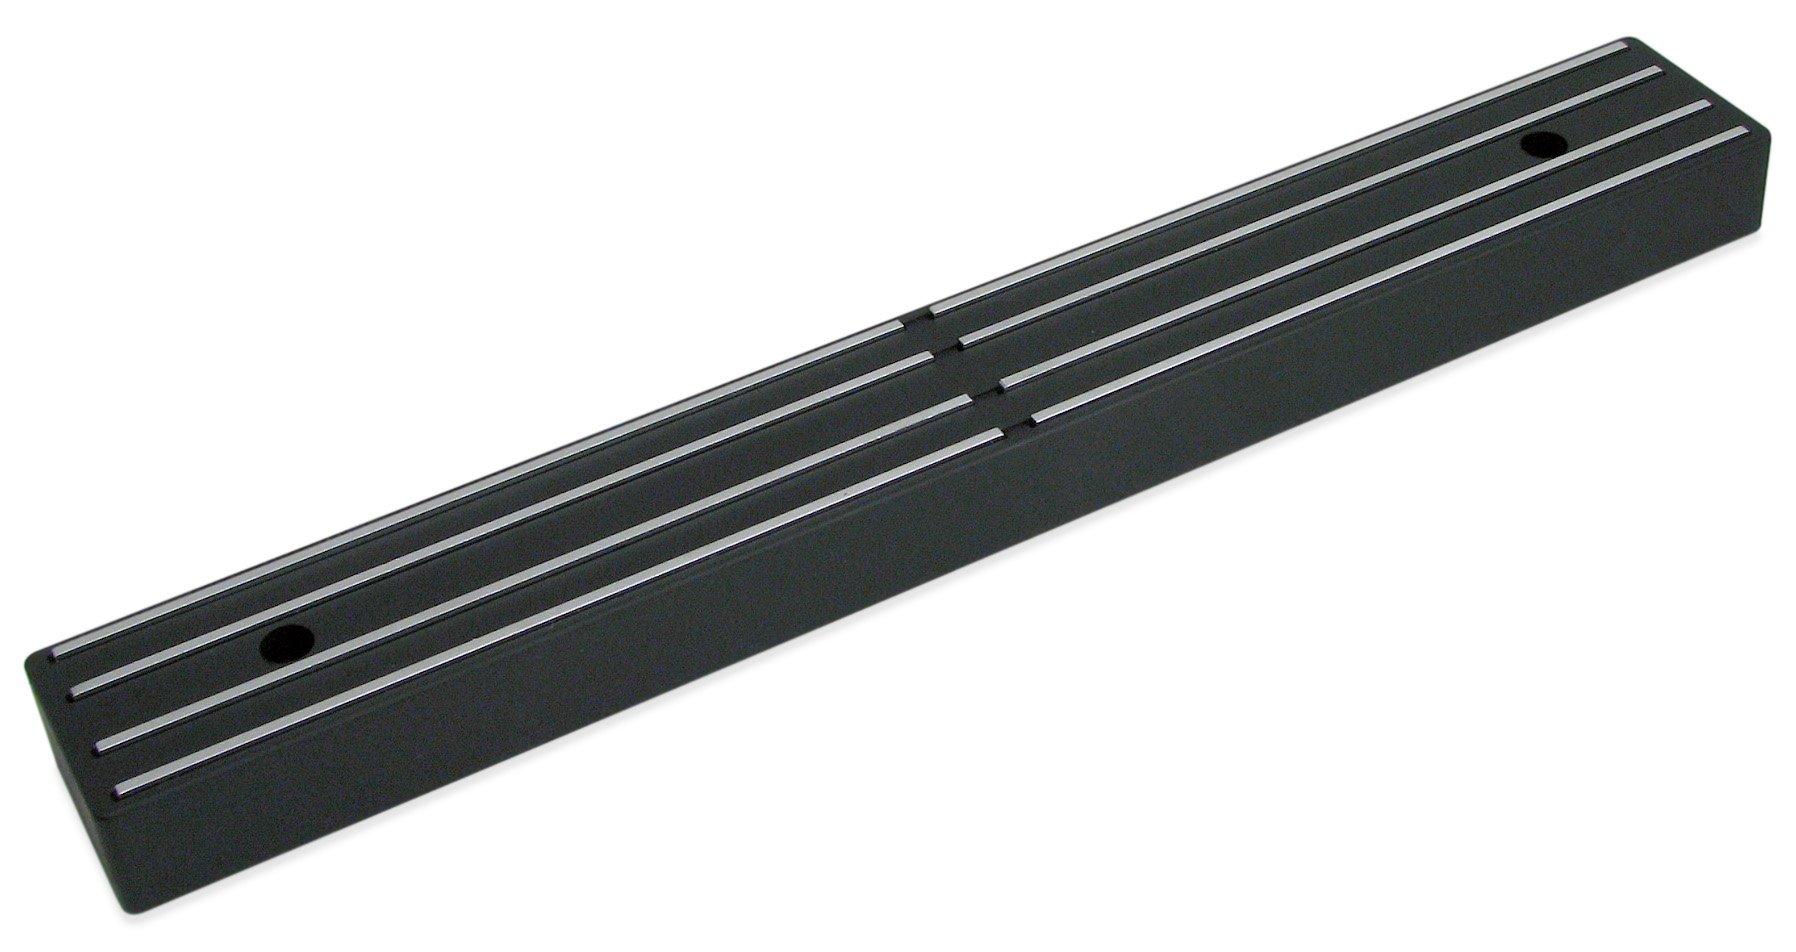 Master Magnetics Magnetic Tool Holder/Magnetic Knife Holder, 12-inch Double-Sided Magnet Strip, Mount on Metal Surface (Black) 07577